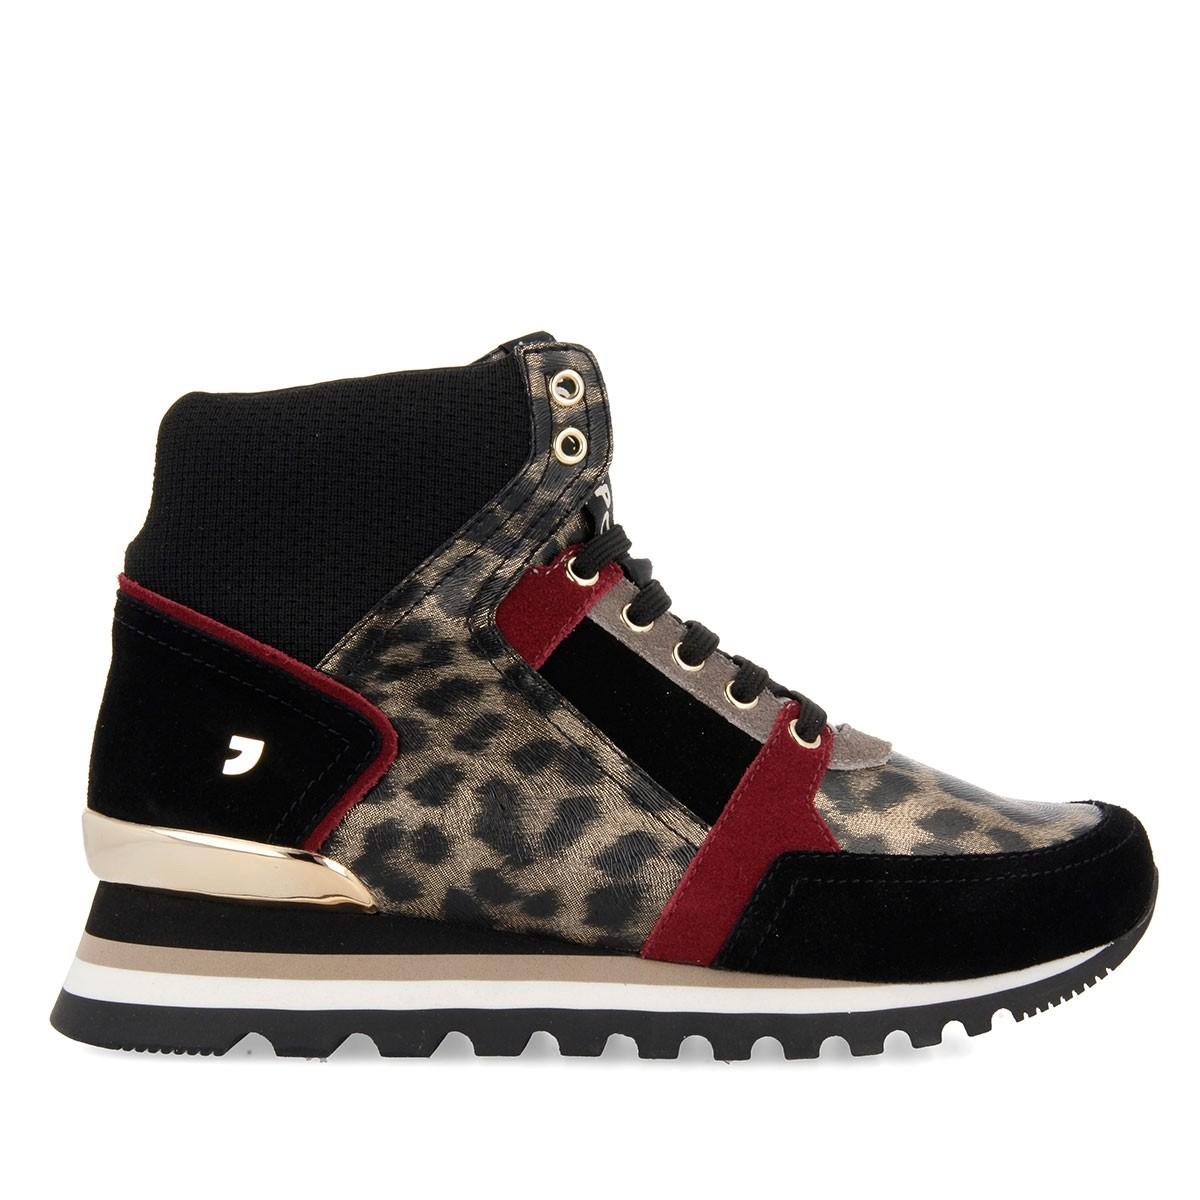 56701 Leopard CASUAL-SPORT 1